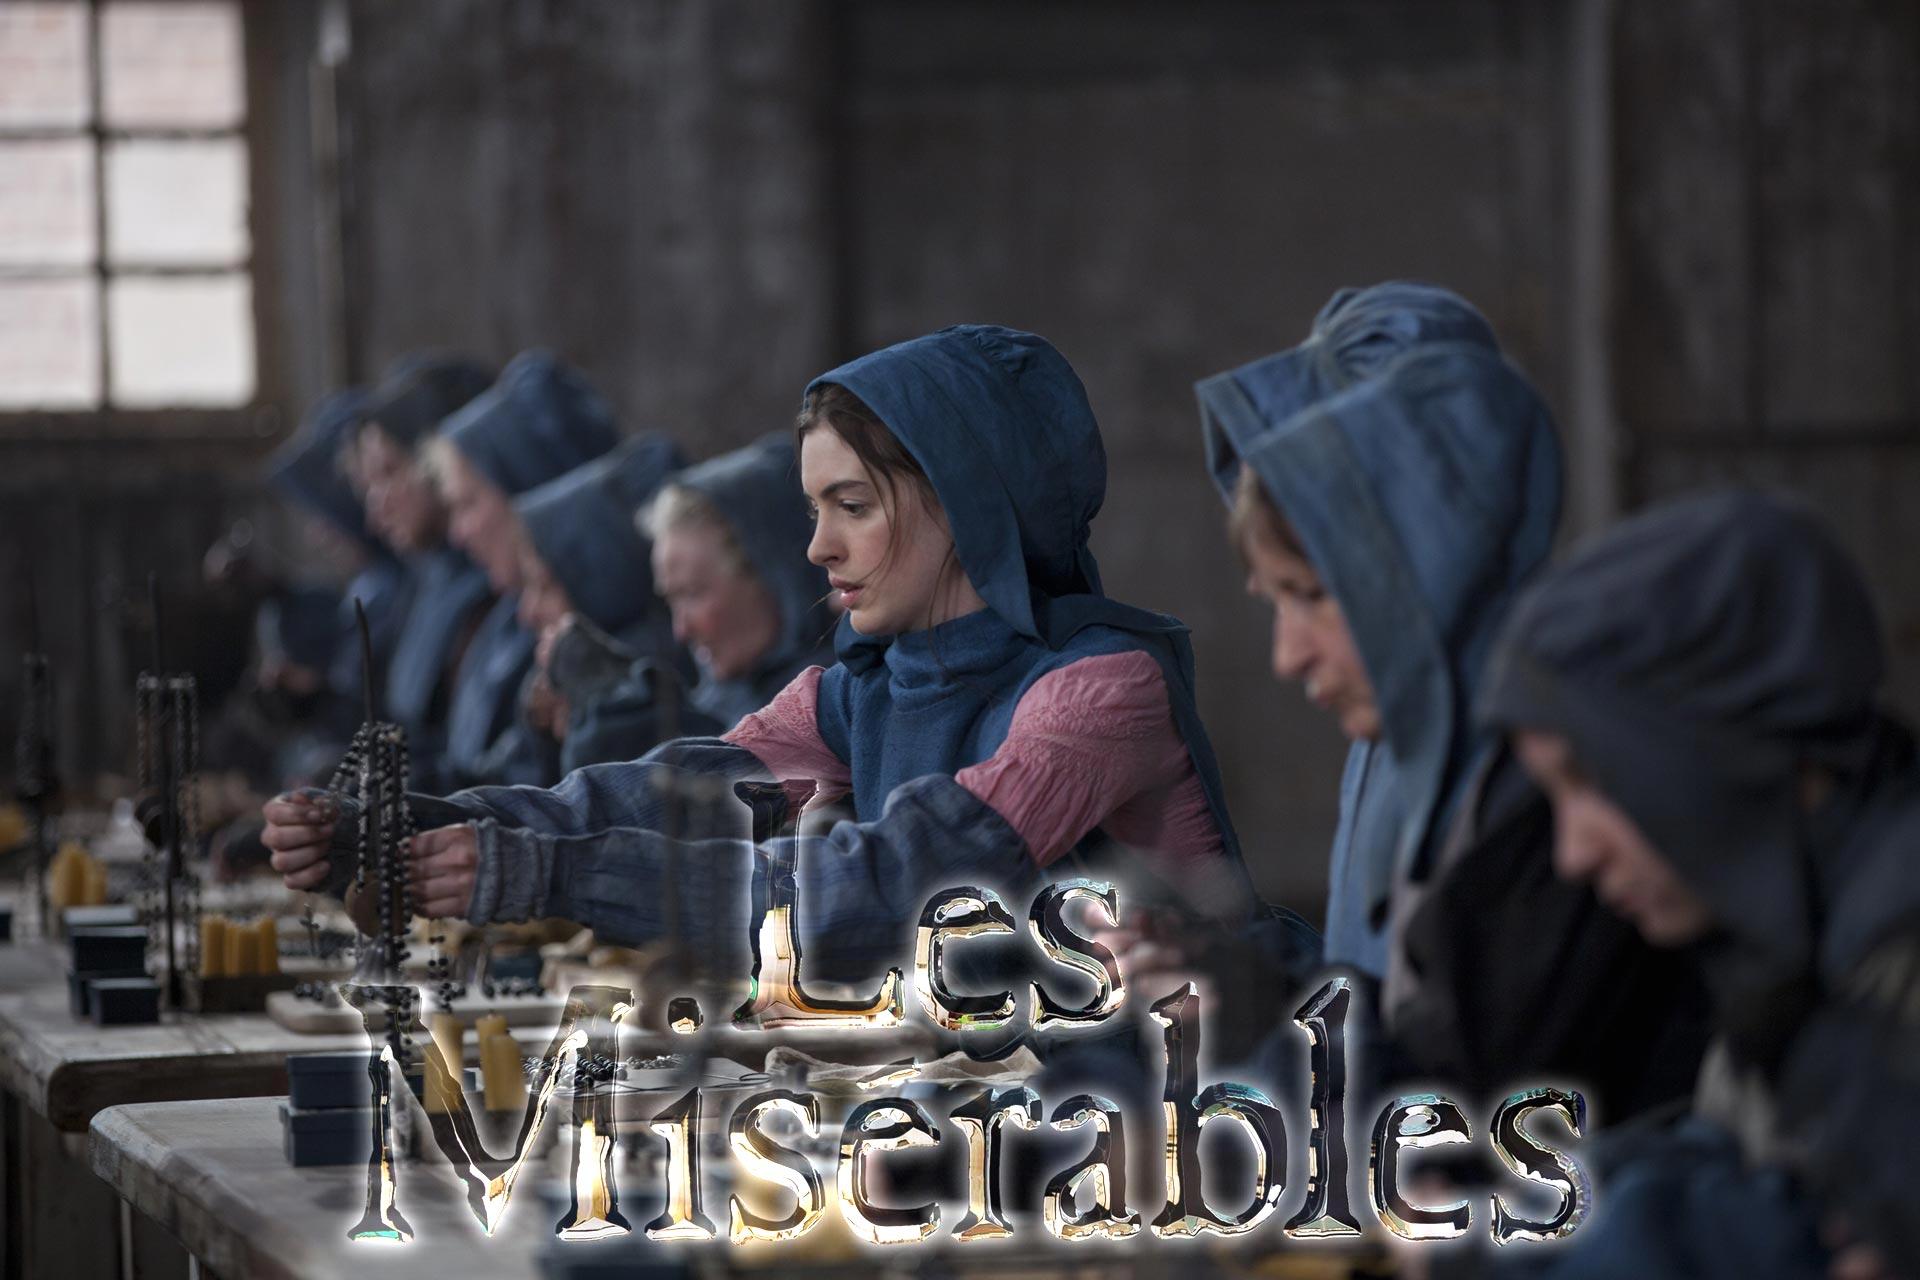 cr 237 tico en serio los miserables les miserables 2012